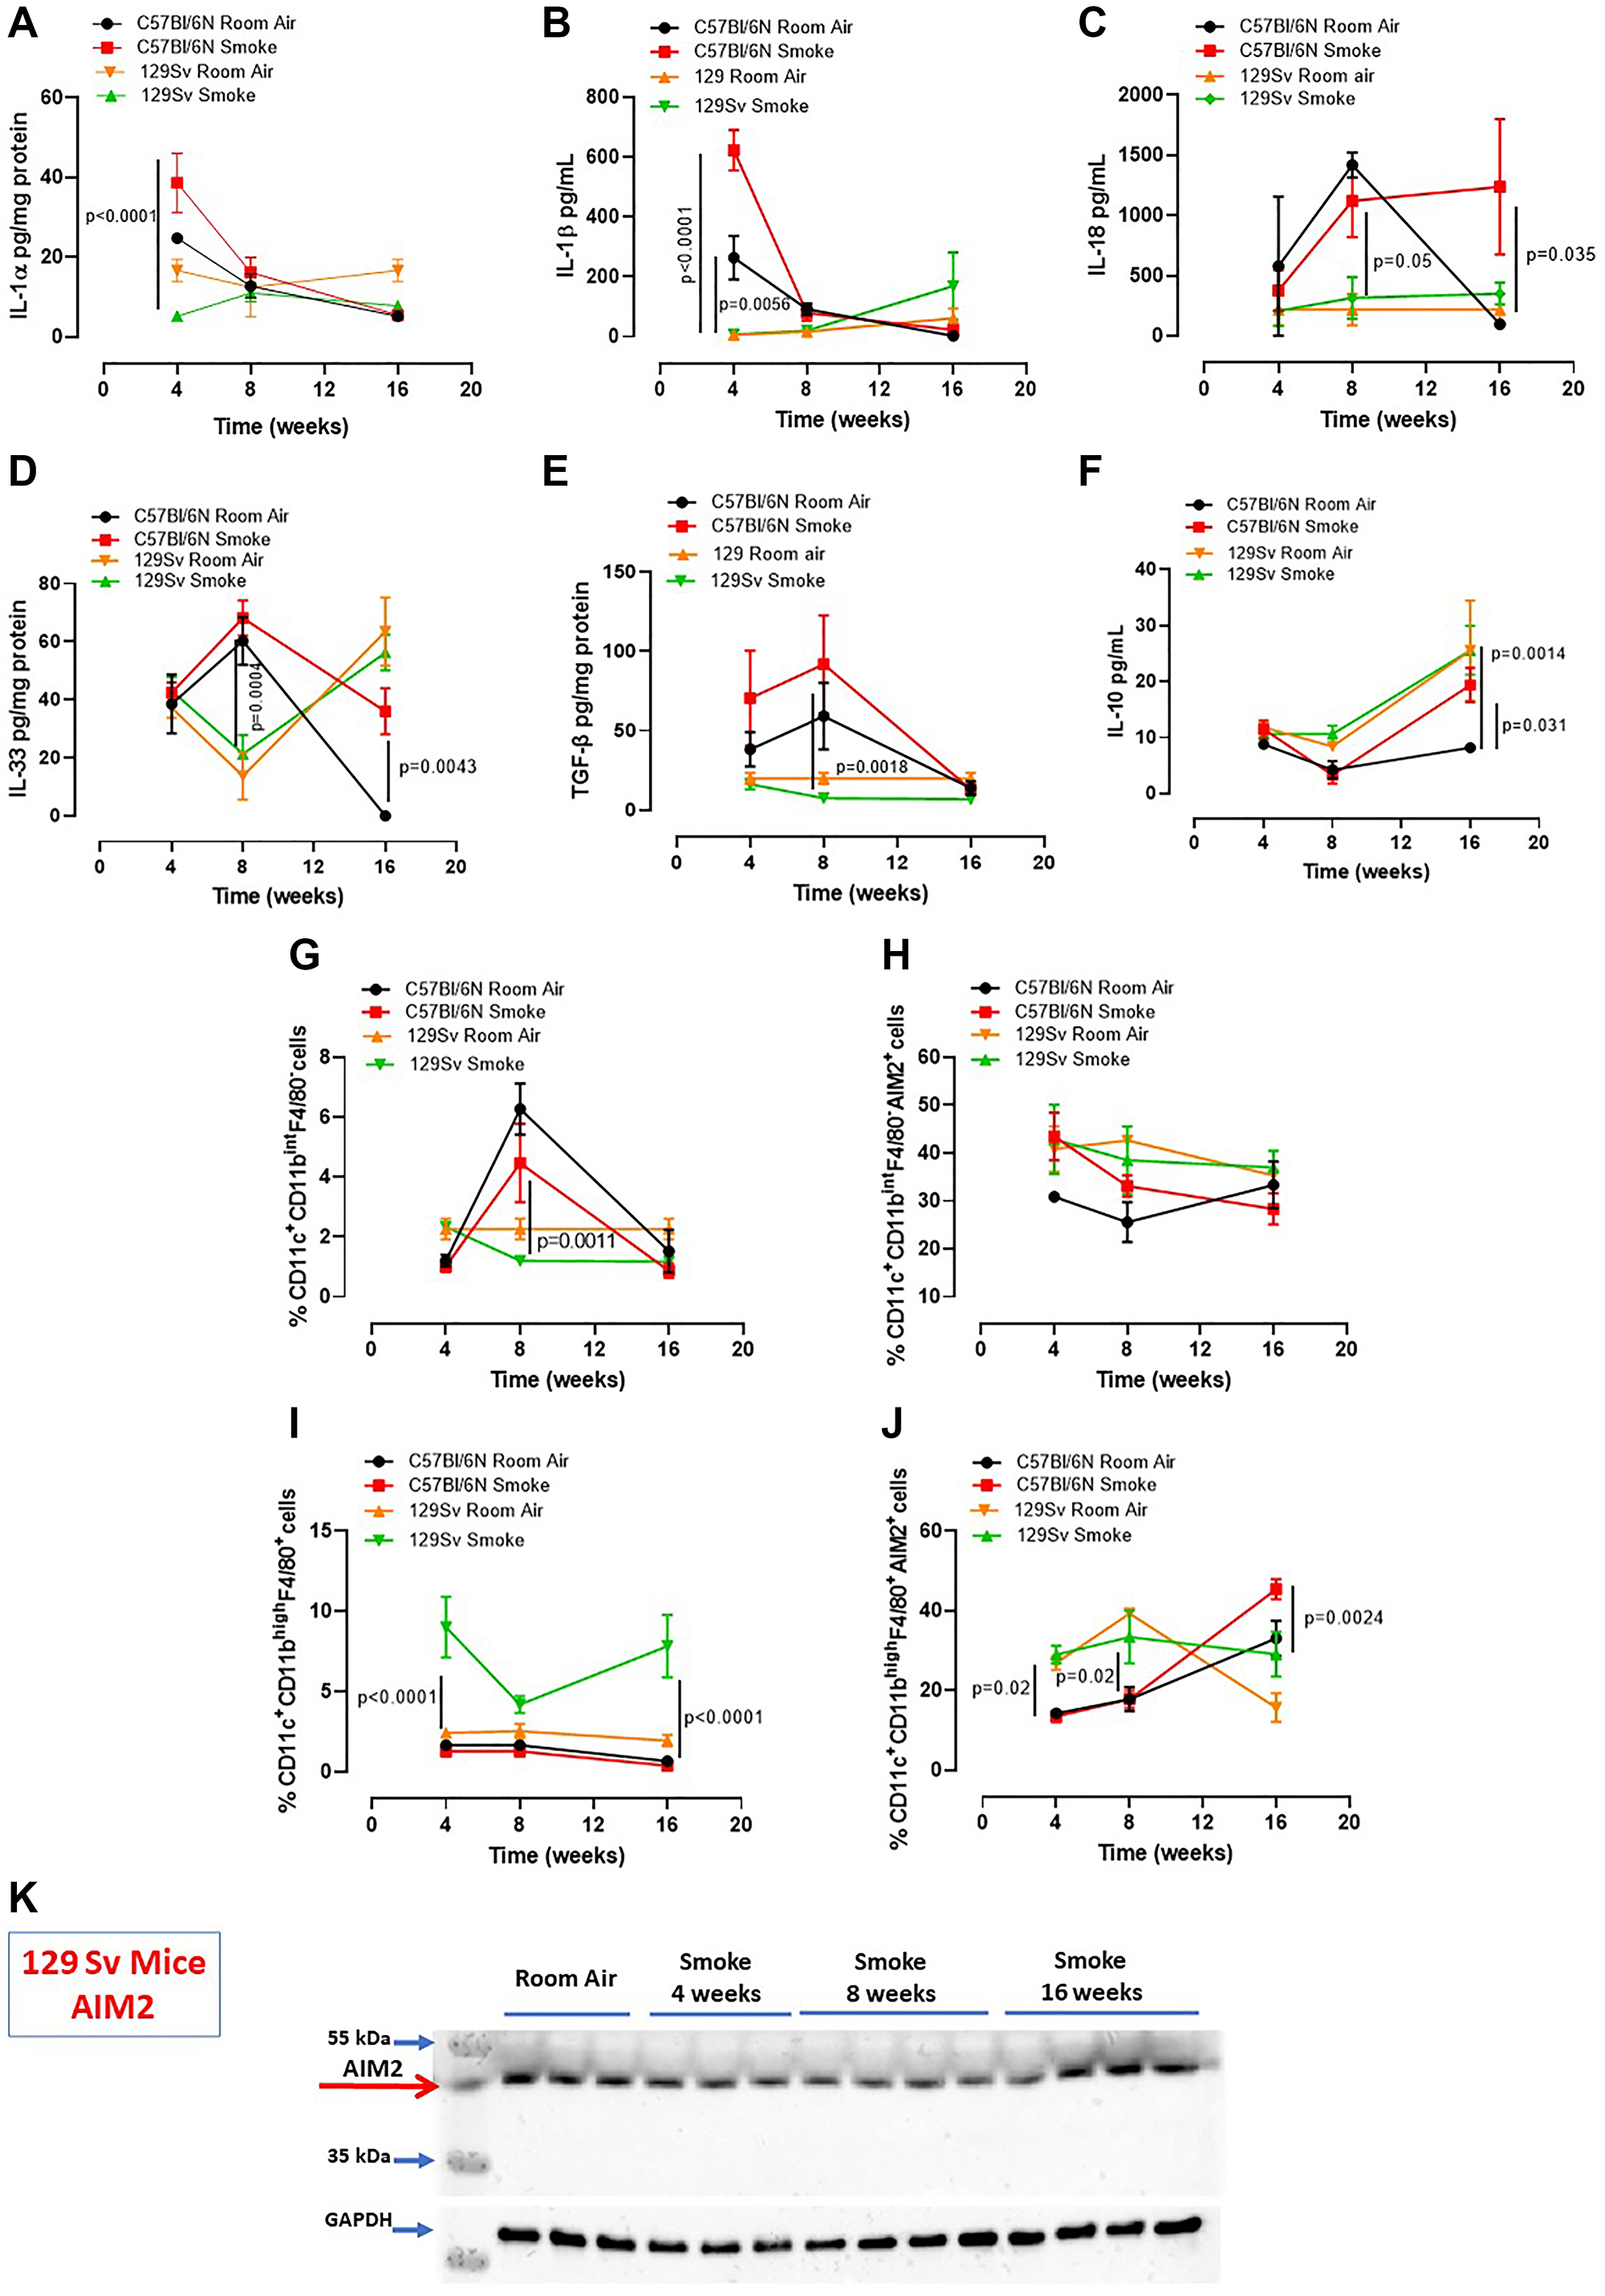 Smoking 129Sv mice had less lung inflammation than C57Bl/6N mice.